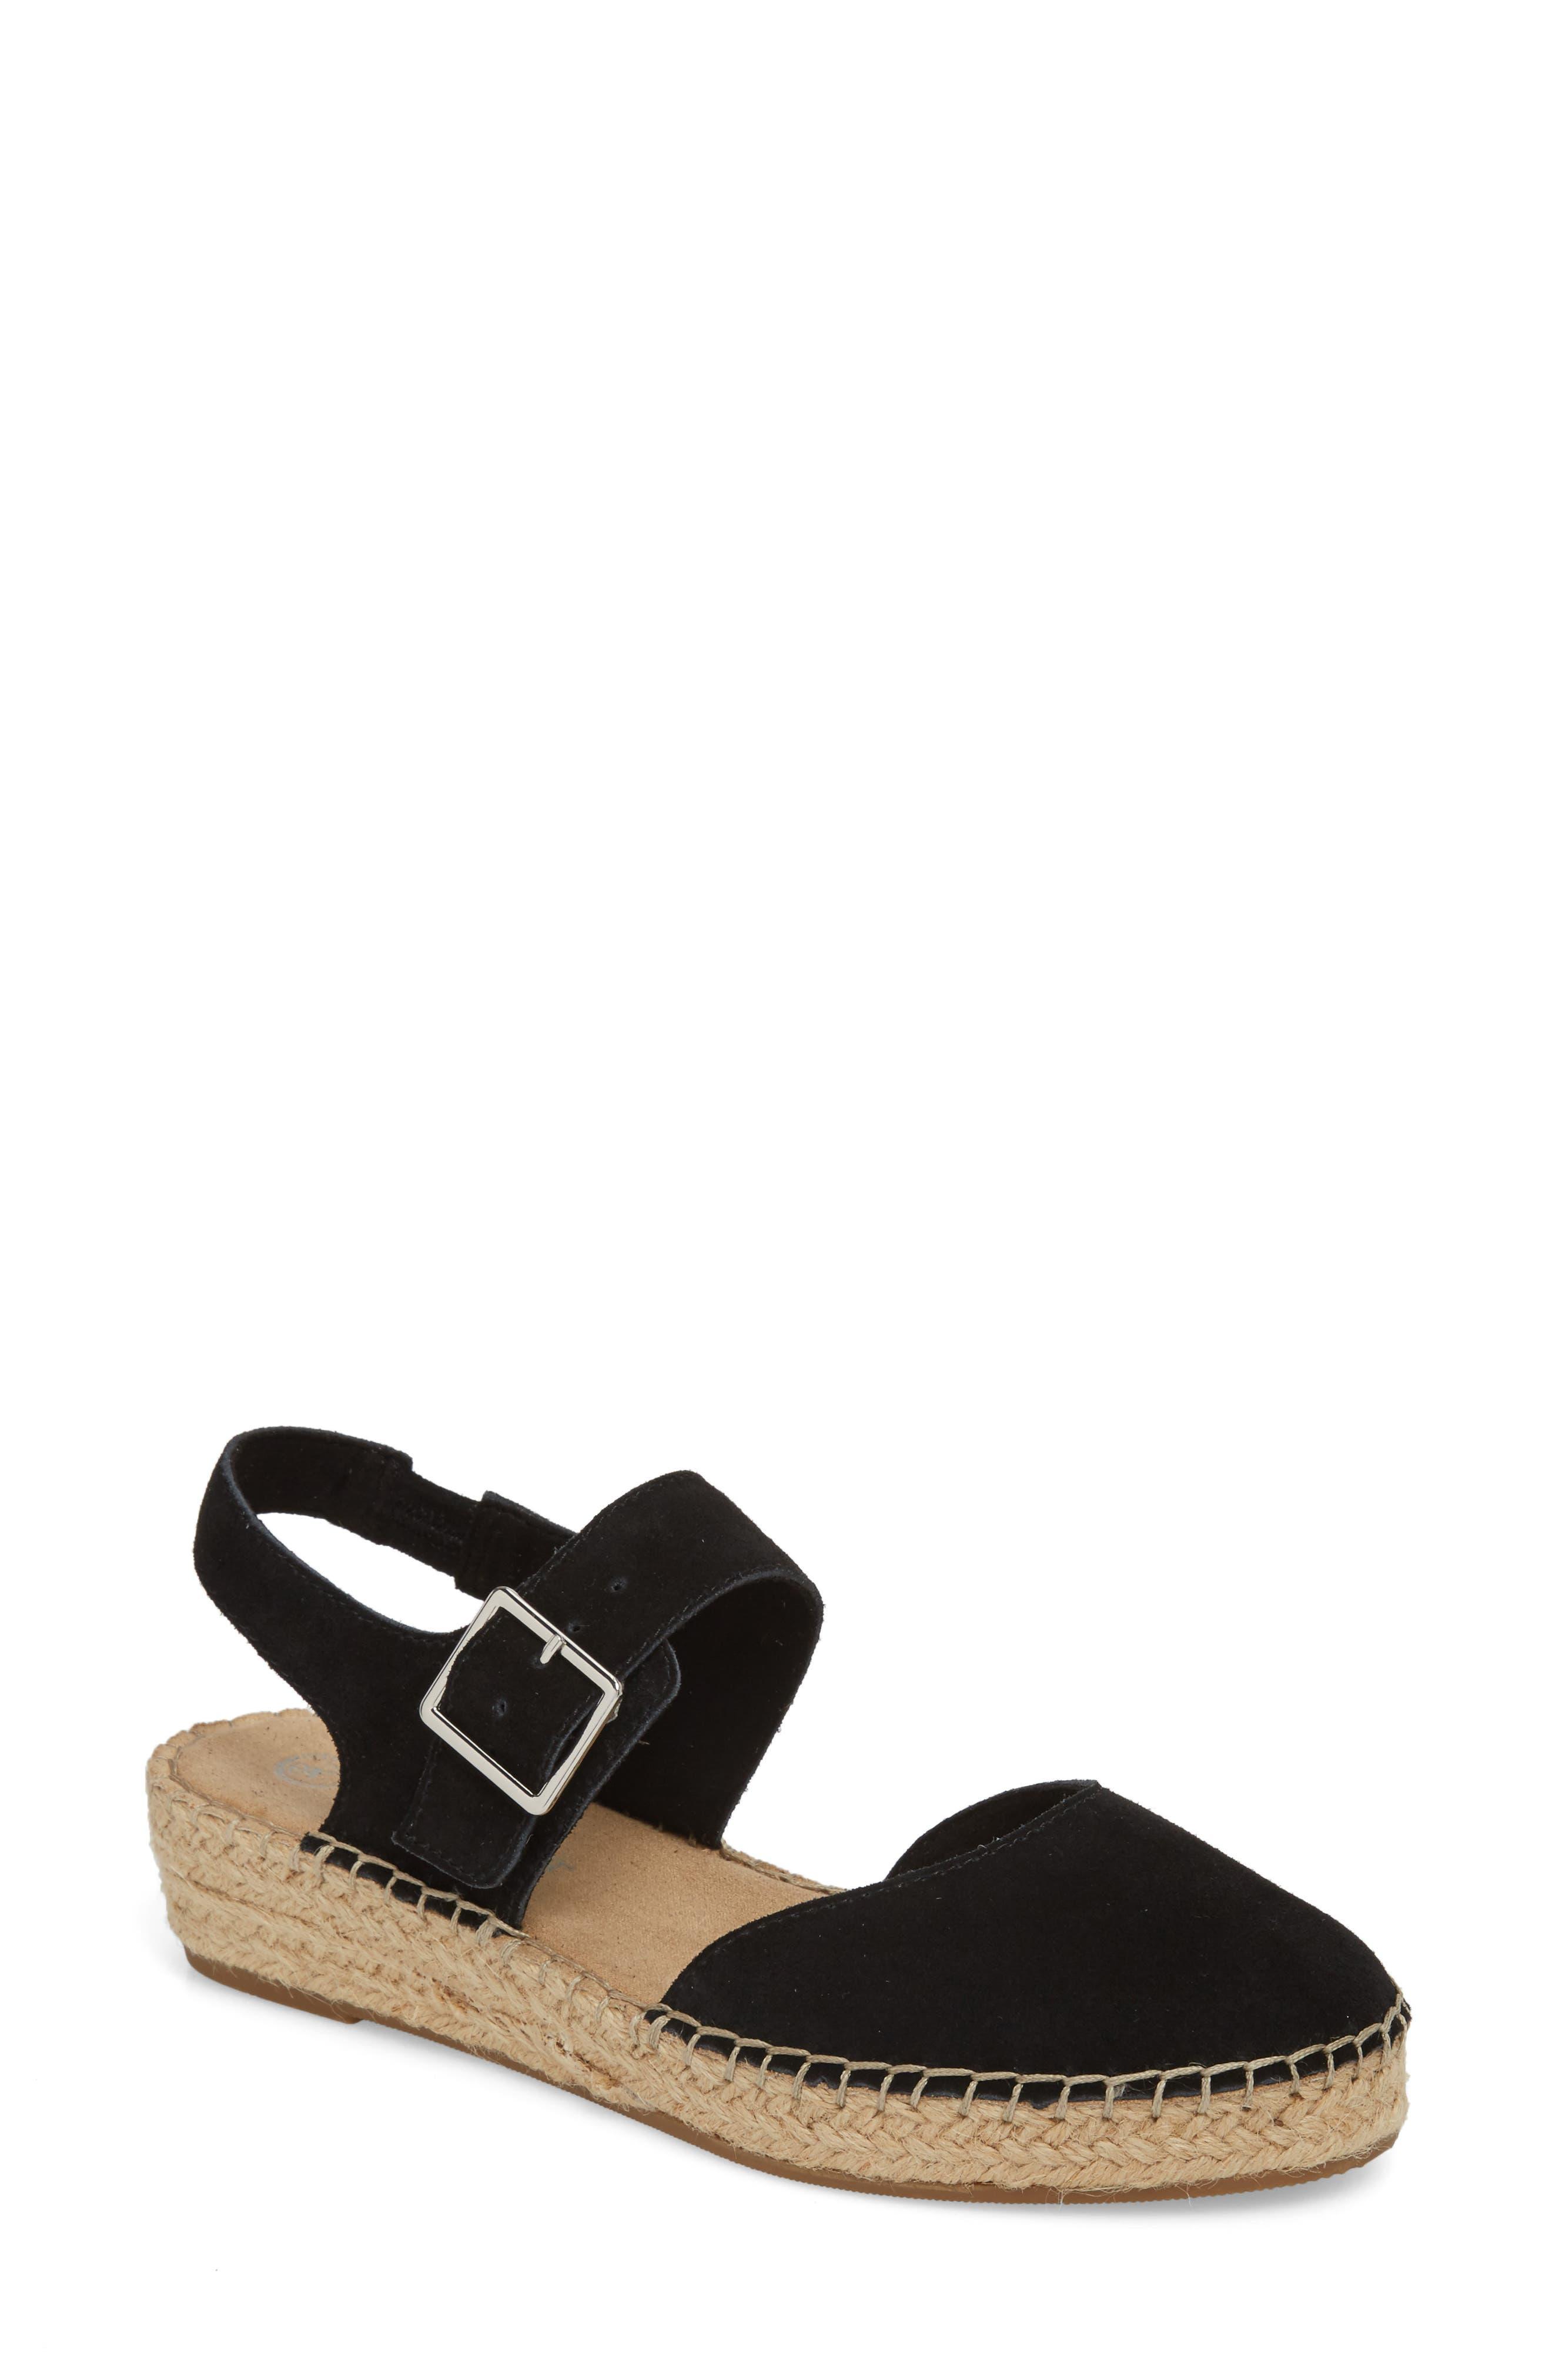 Caralynn Espadrille Sandal,                         Main,                         color, BLACK SUEDE